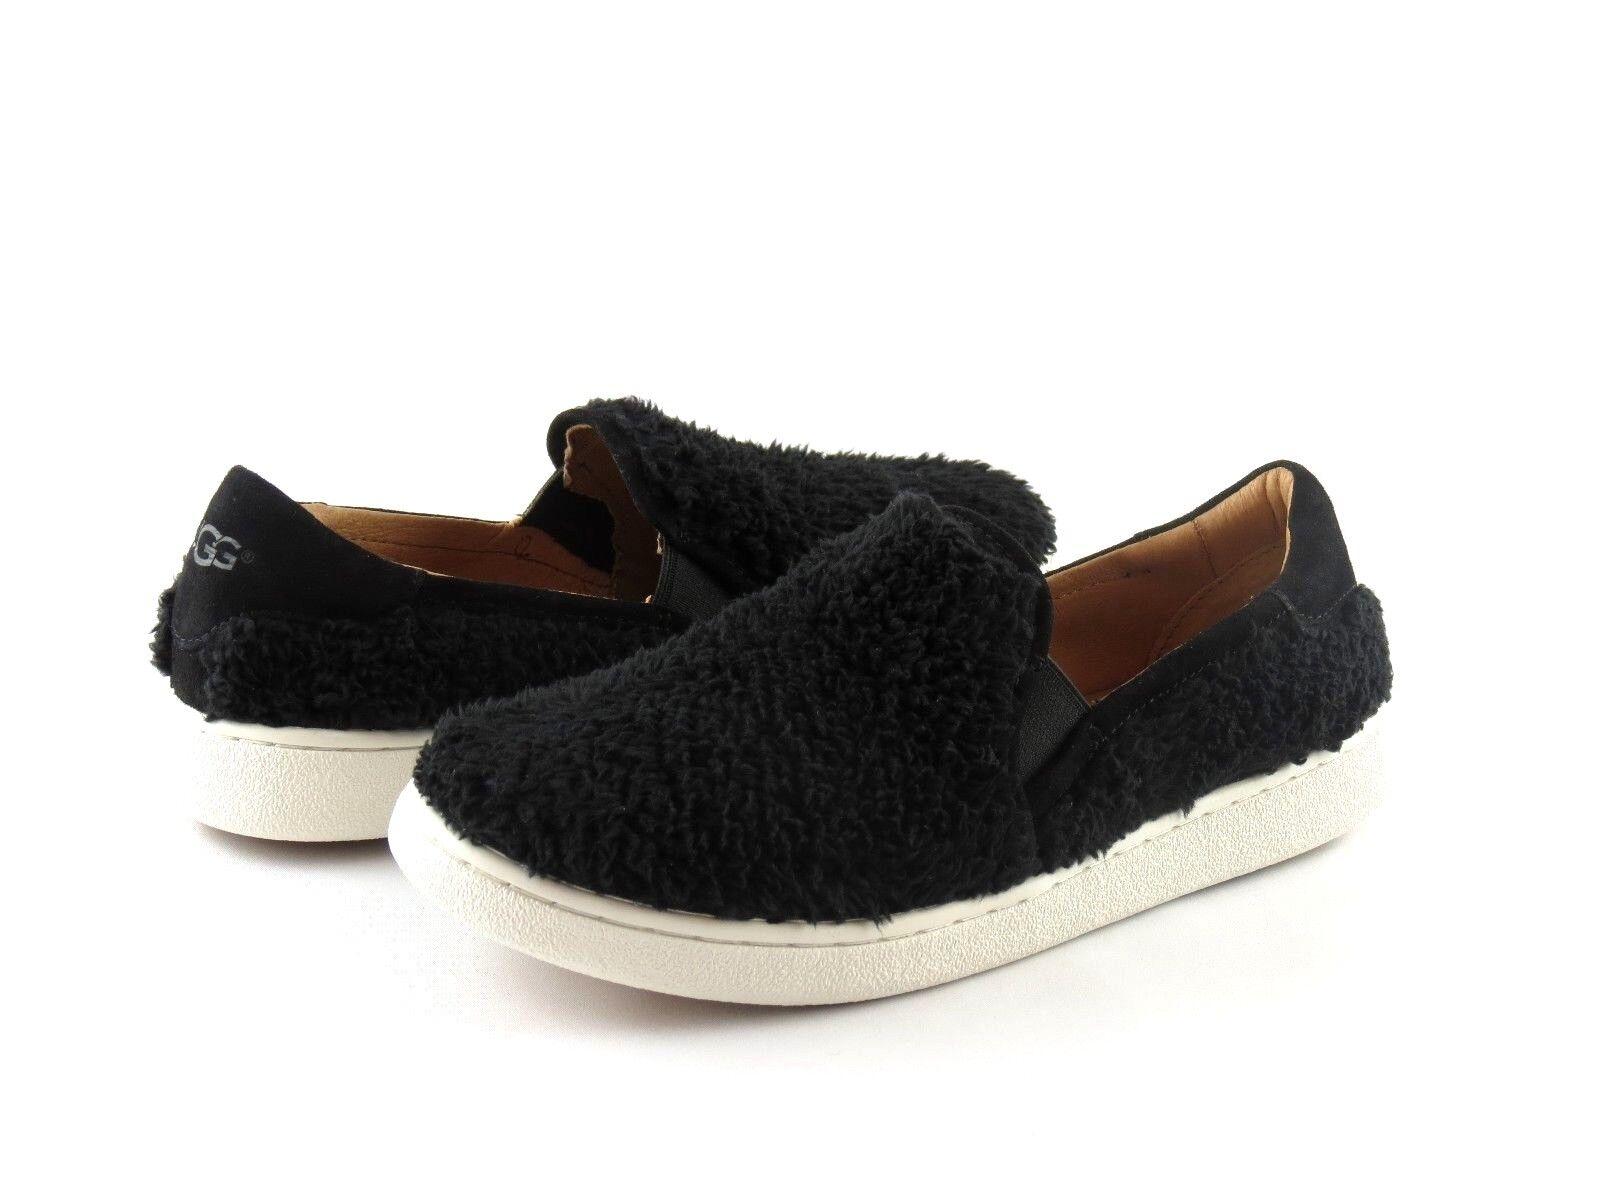 4869e5616a4 UGG Australia Ricci Black Sheepskin Shearling Slip on Loafer Sneaker Size 6